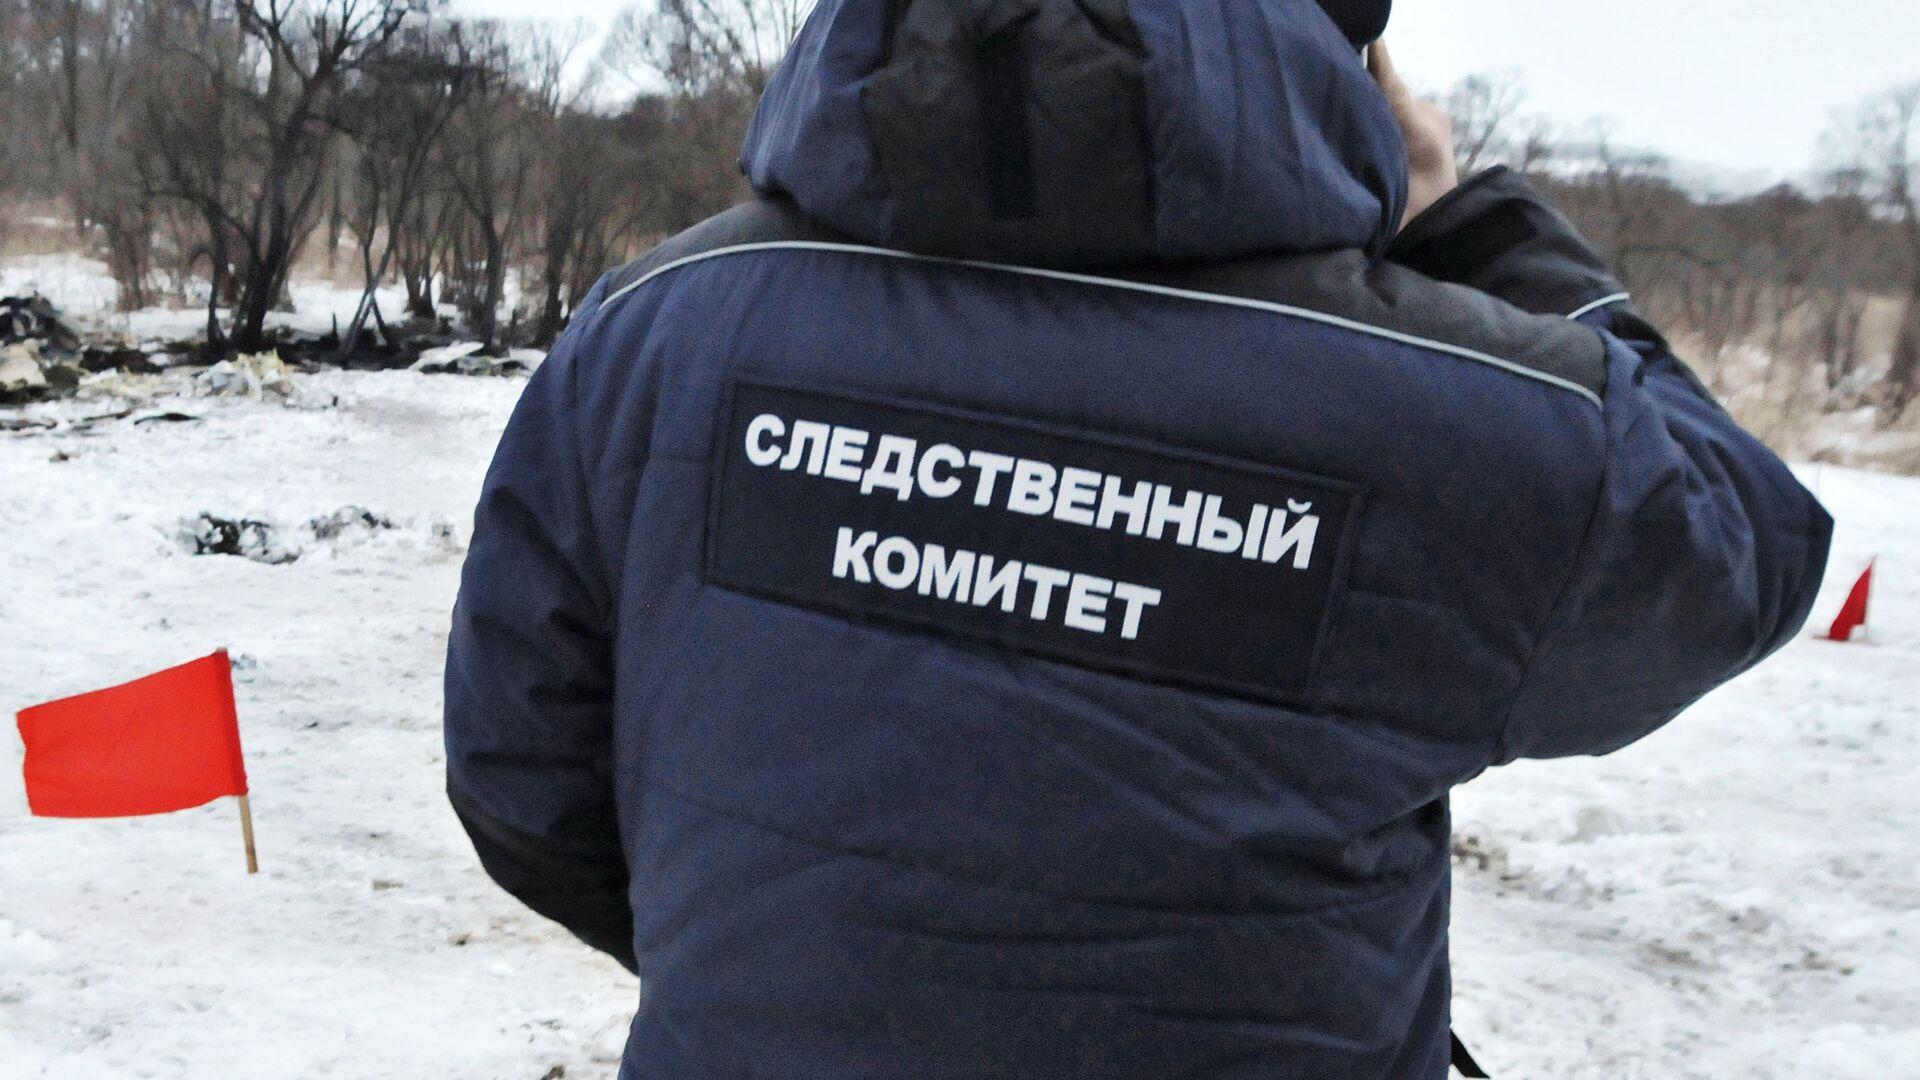 Сотрудник Следственого комитета - РИА Новости, 1920, 02.01.2020